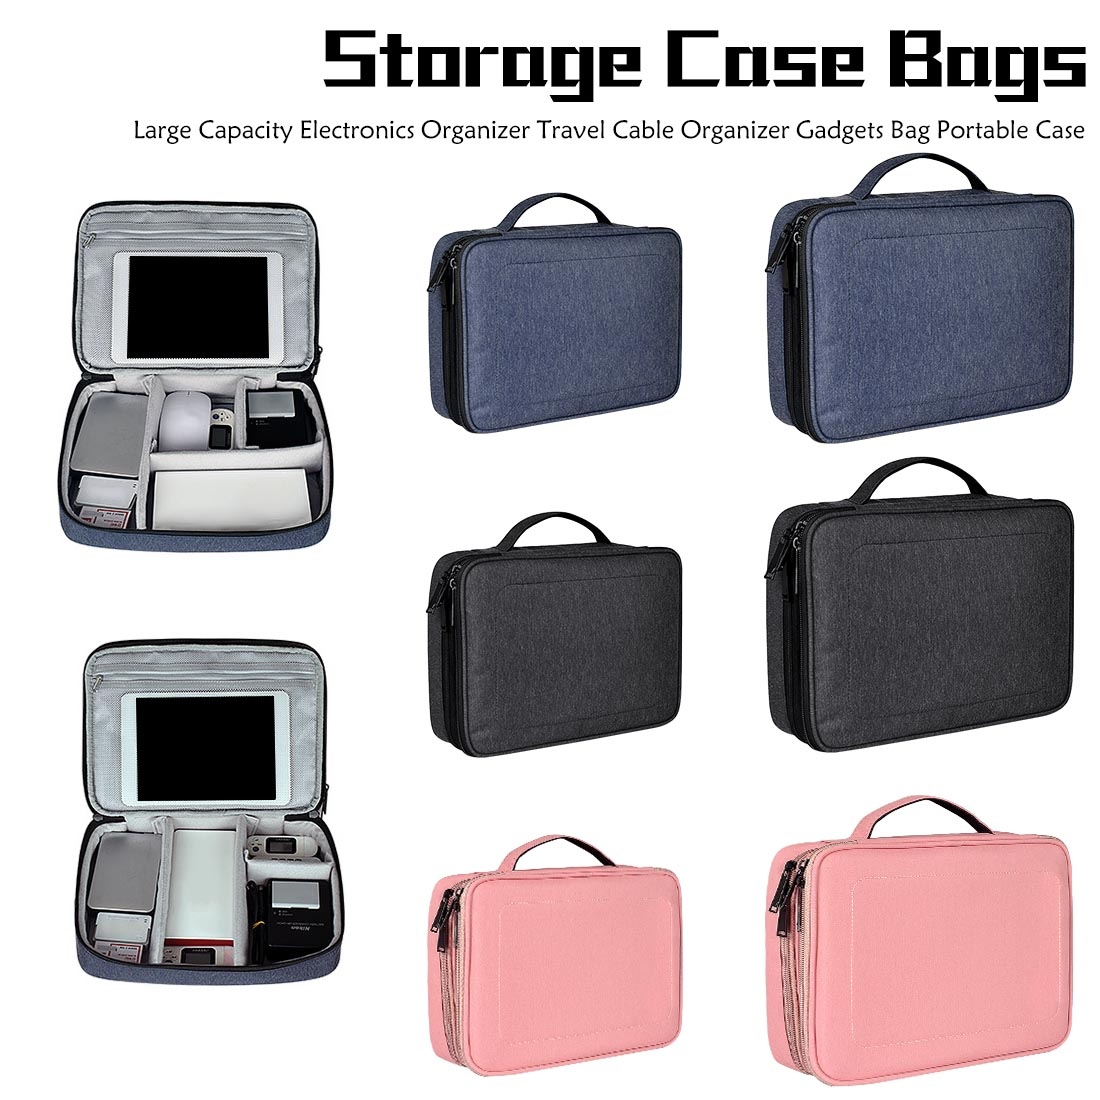 Digital Accessories Storage Bag Travel Cable Organizer Gadgets Bag Portable Case Large Capacity Electronics Organizer